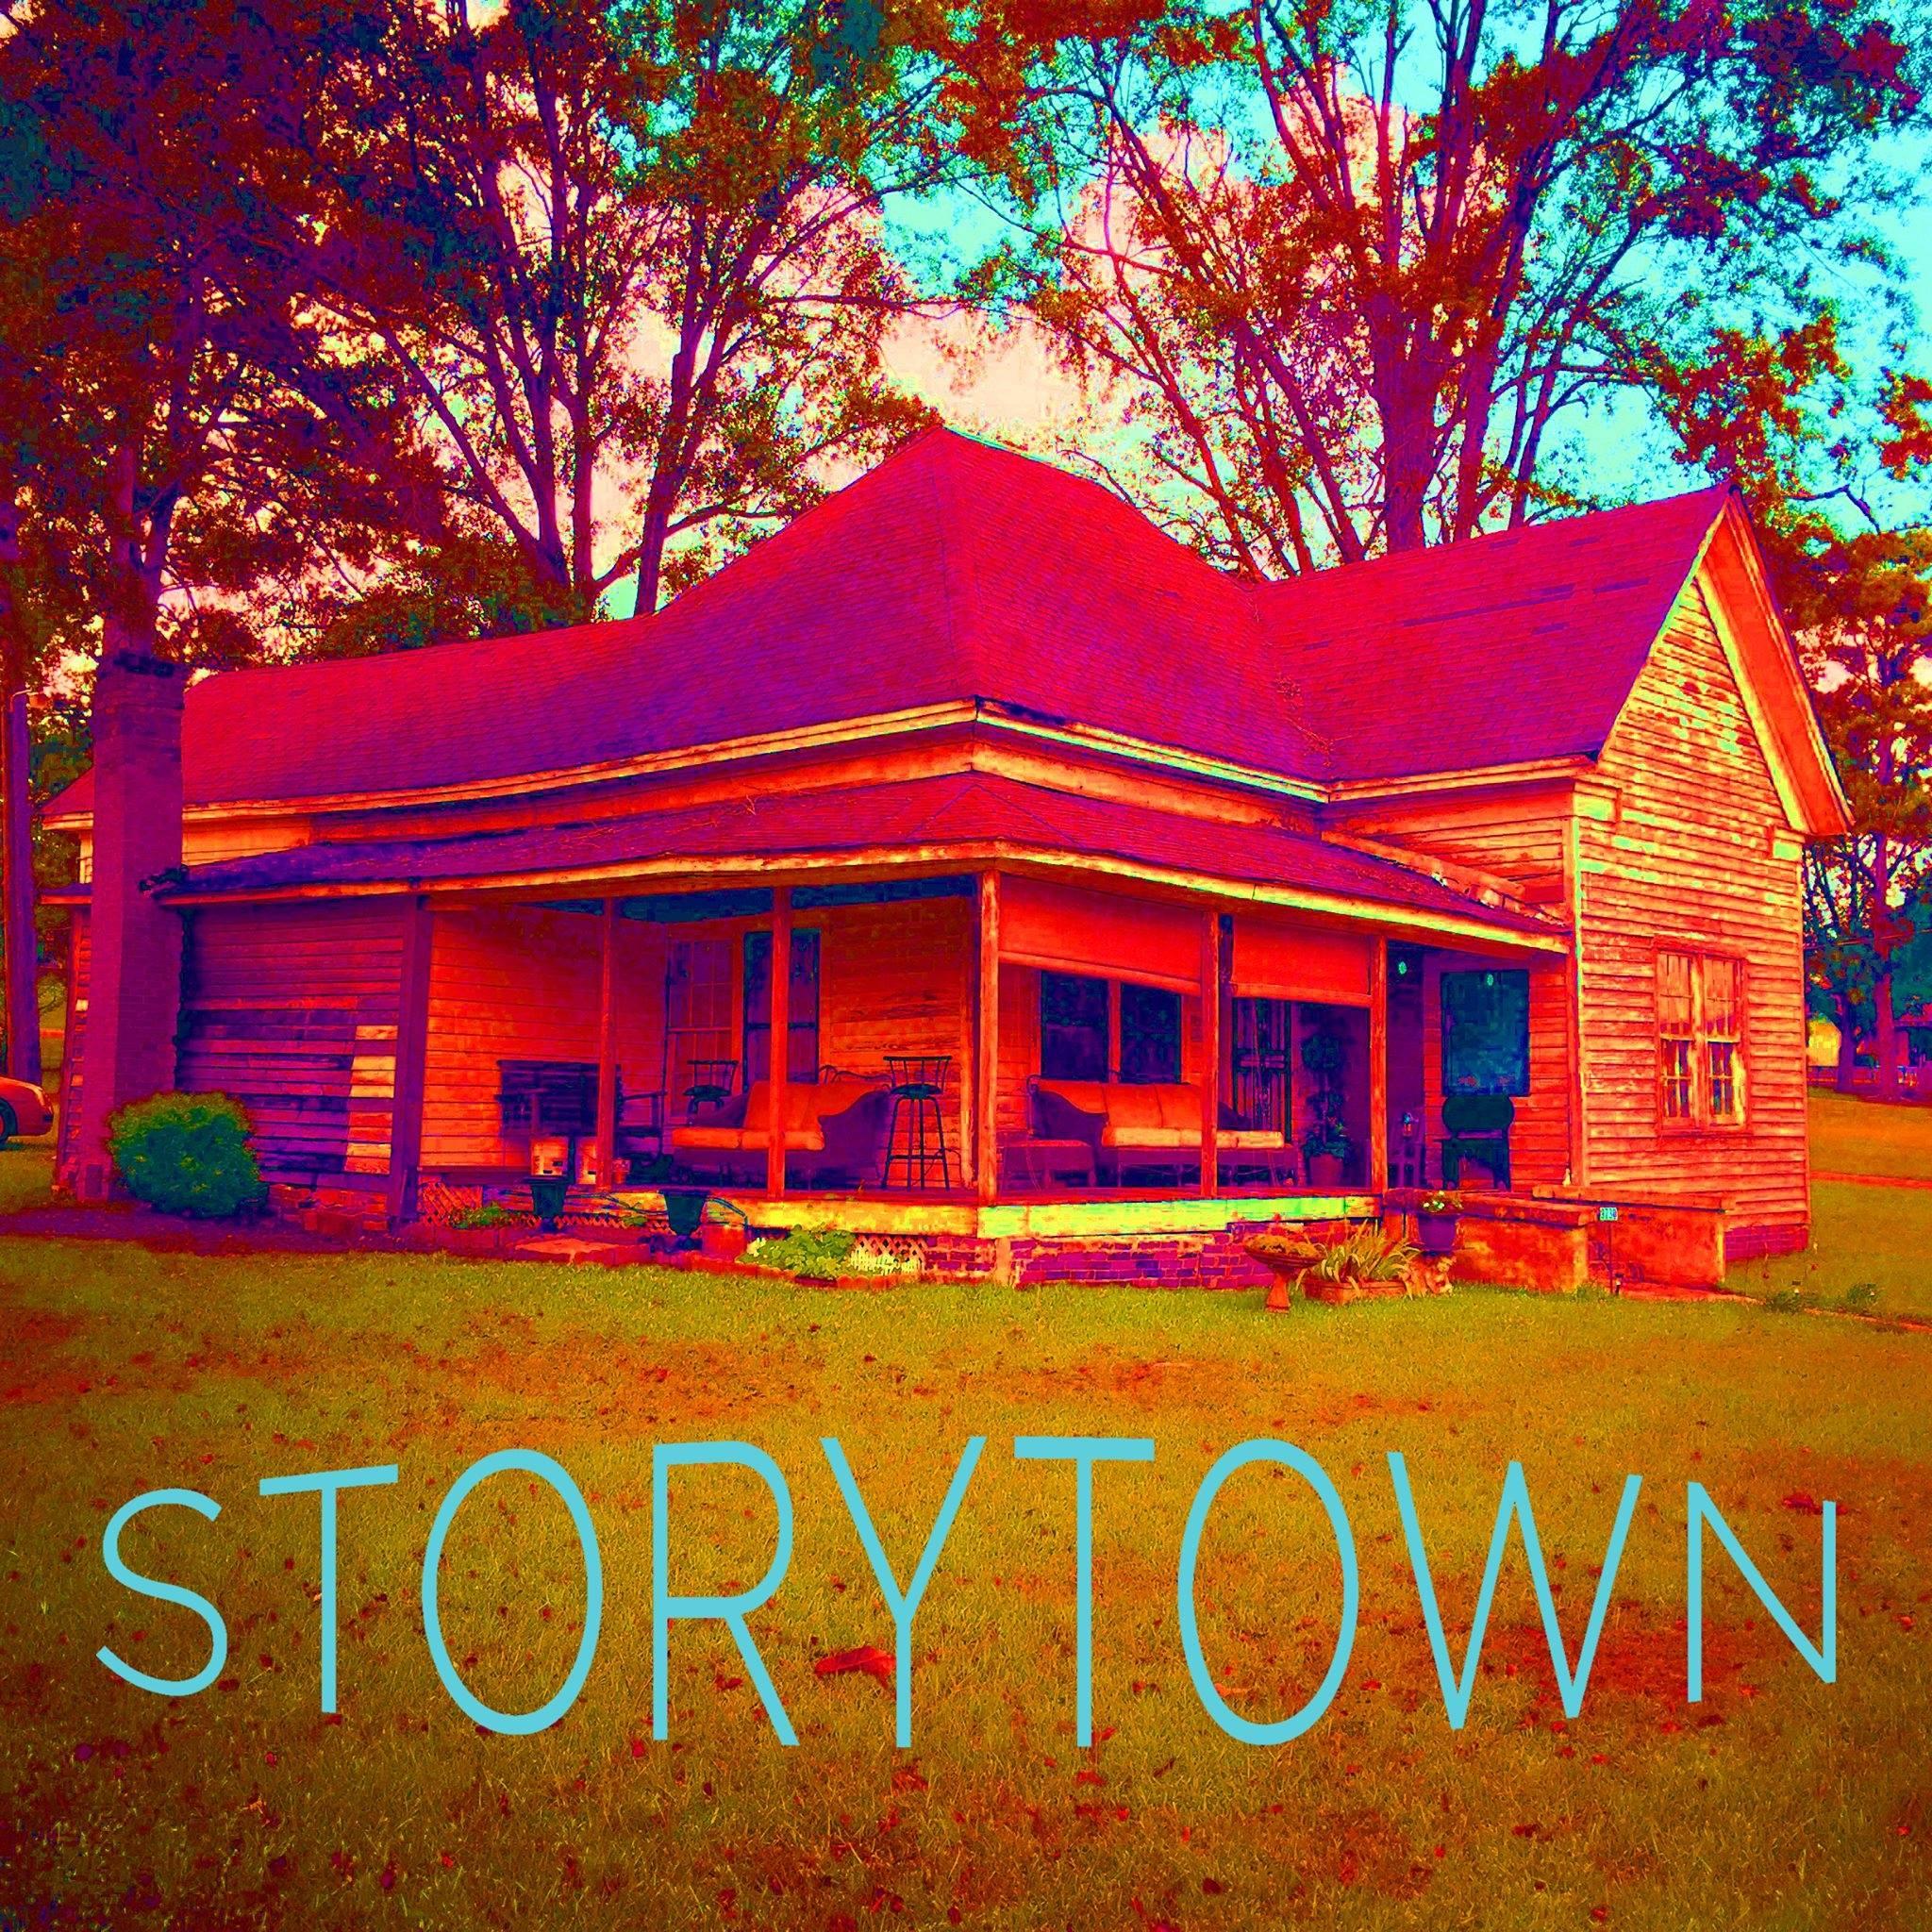 Storytown.jpg